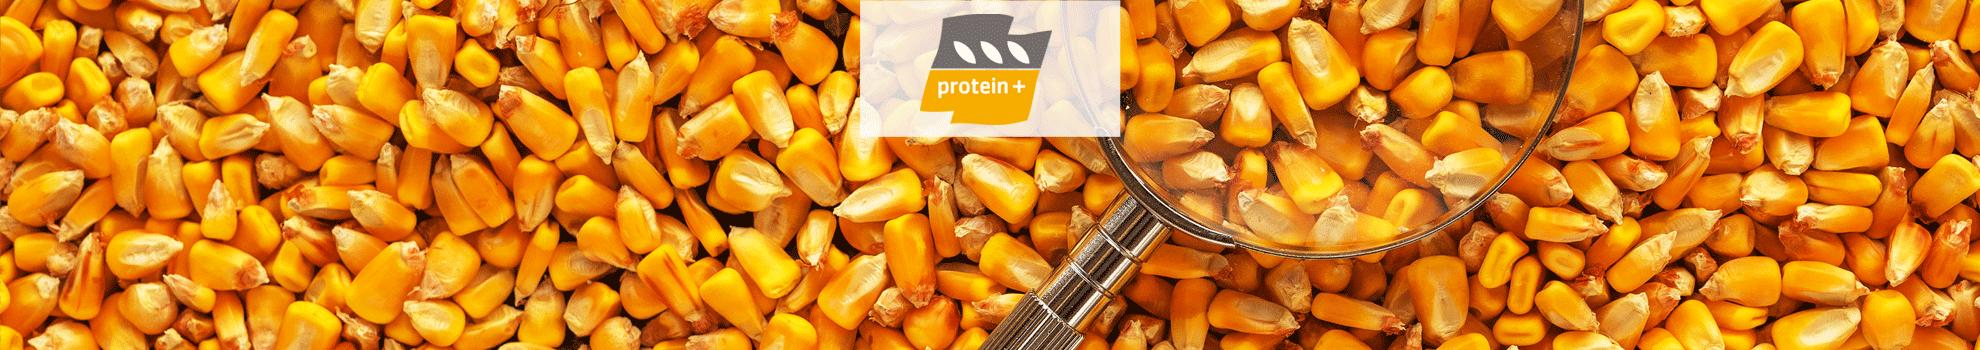 protein +